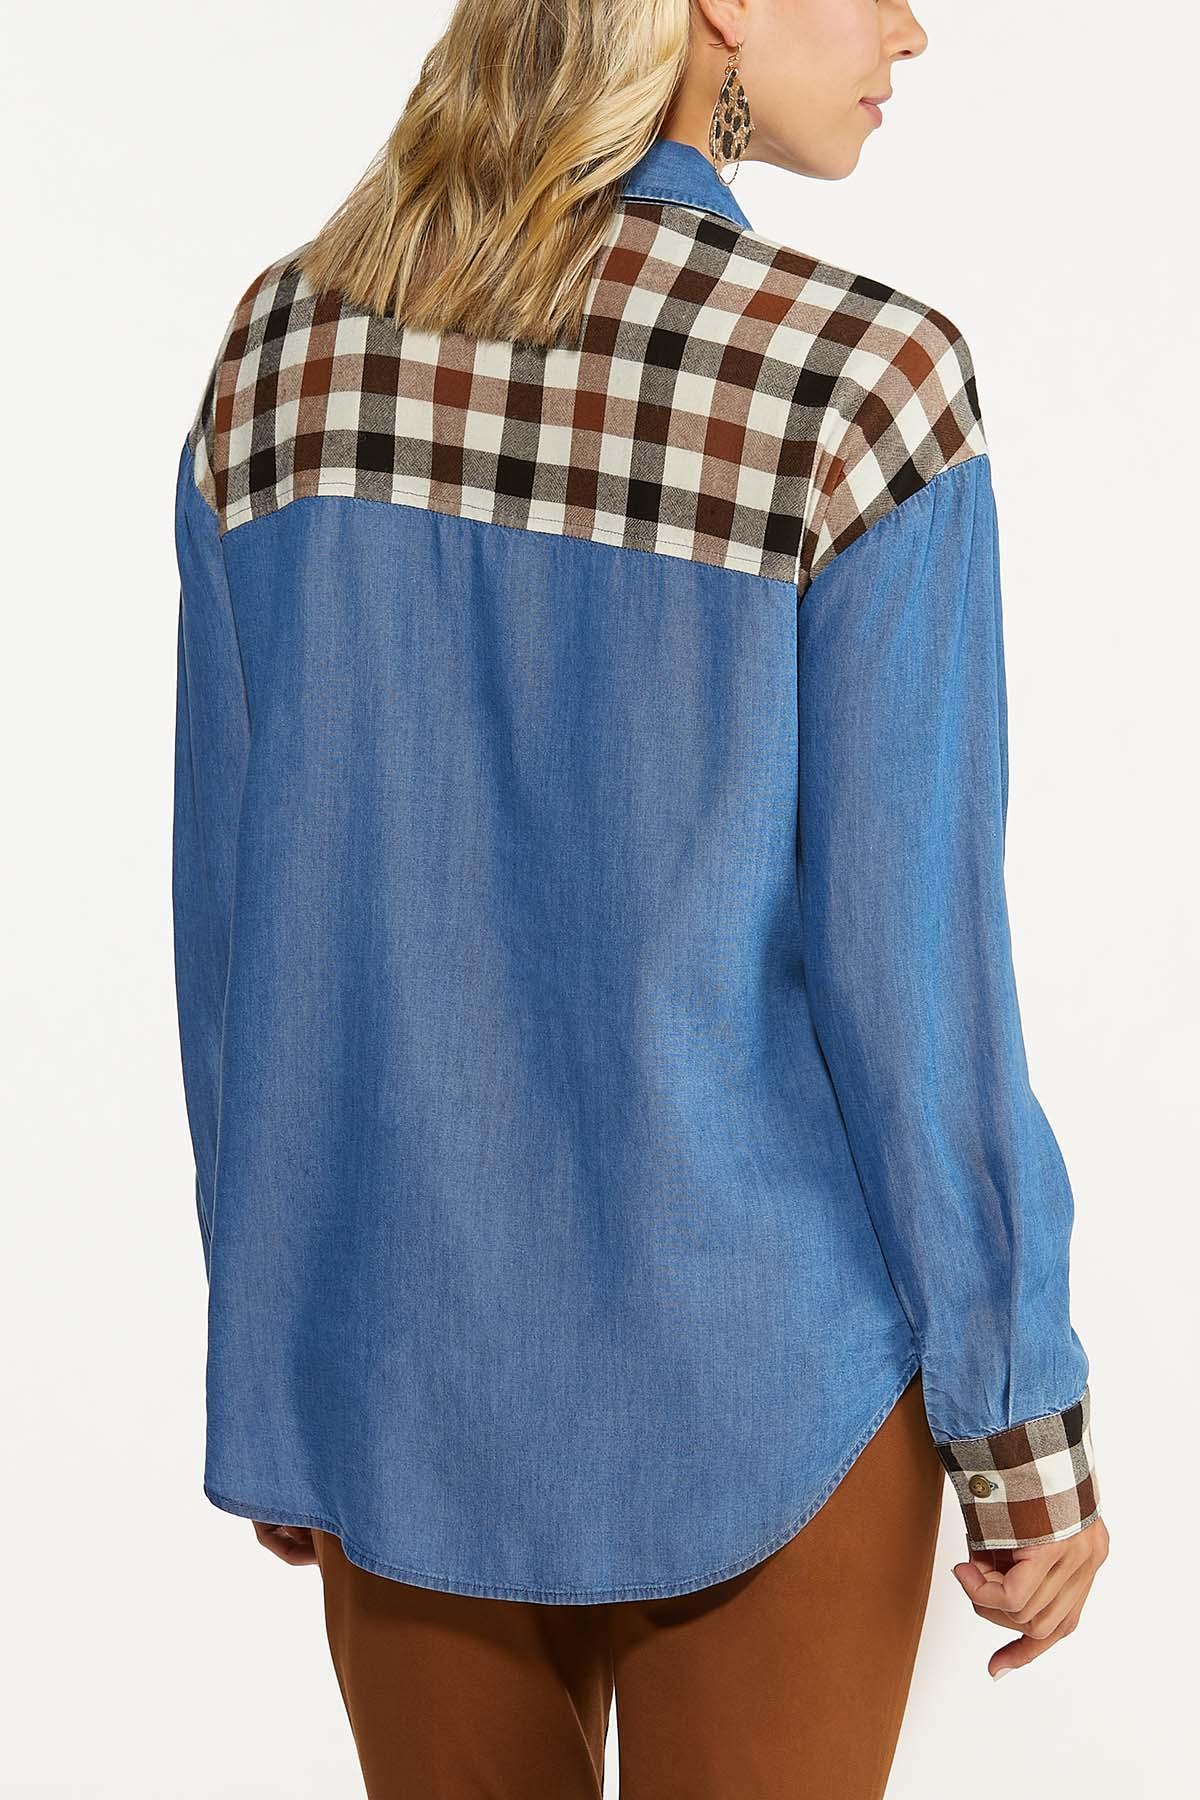 Plaid Panel Chambray Shirt (Item #44666921)